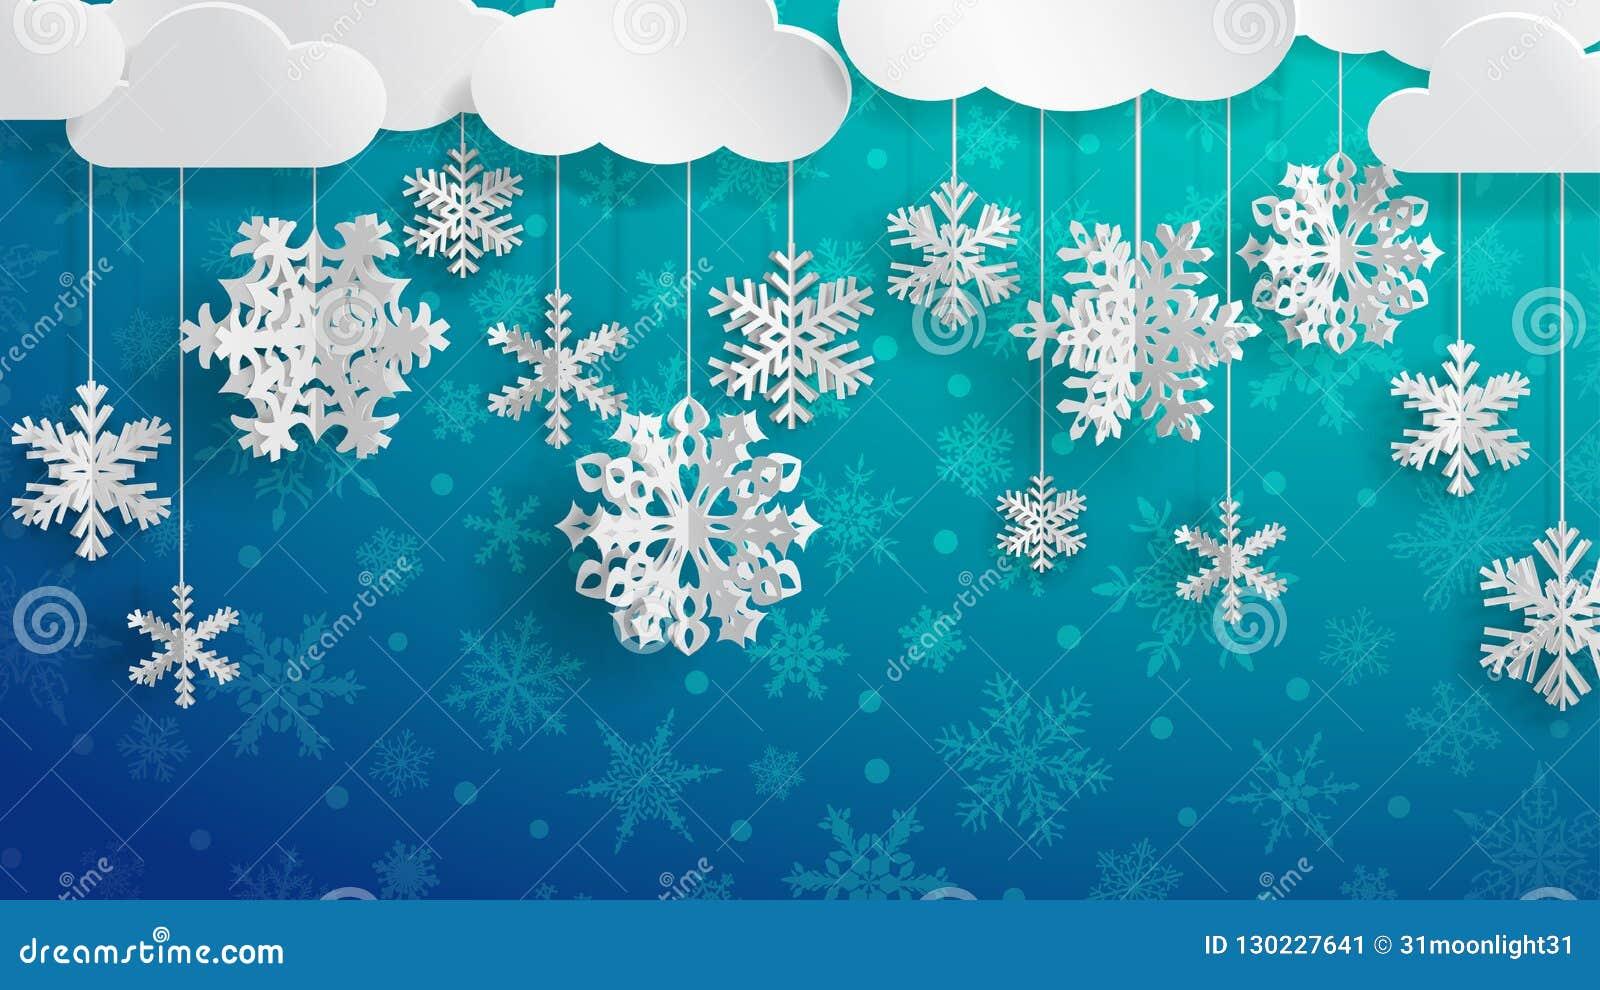 Fiocchi Di Neve Di Carta Modelli : Fondo di natale con i fiocchi di neve di carta tridimensionali